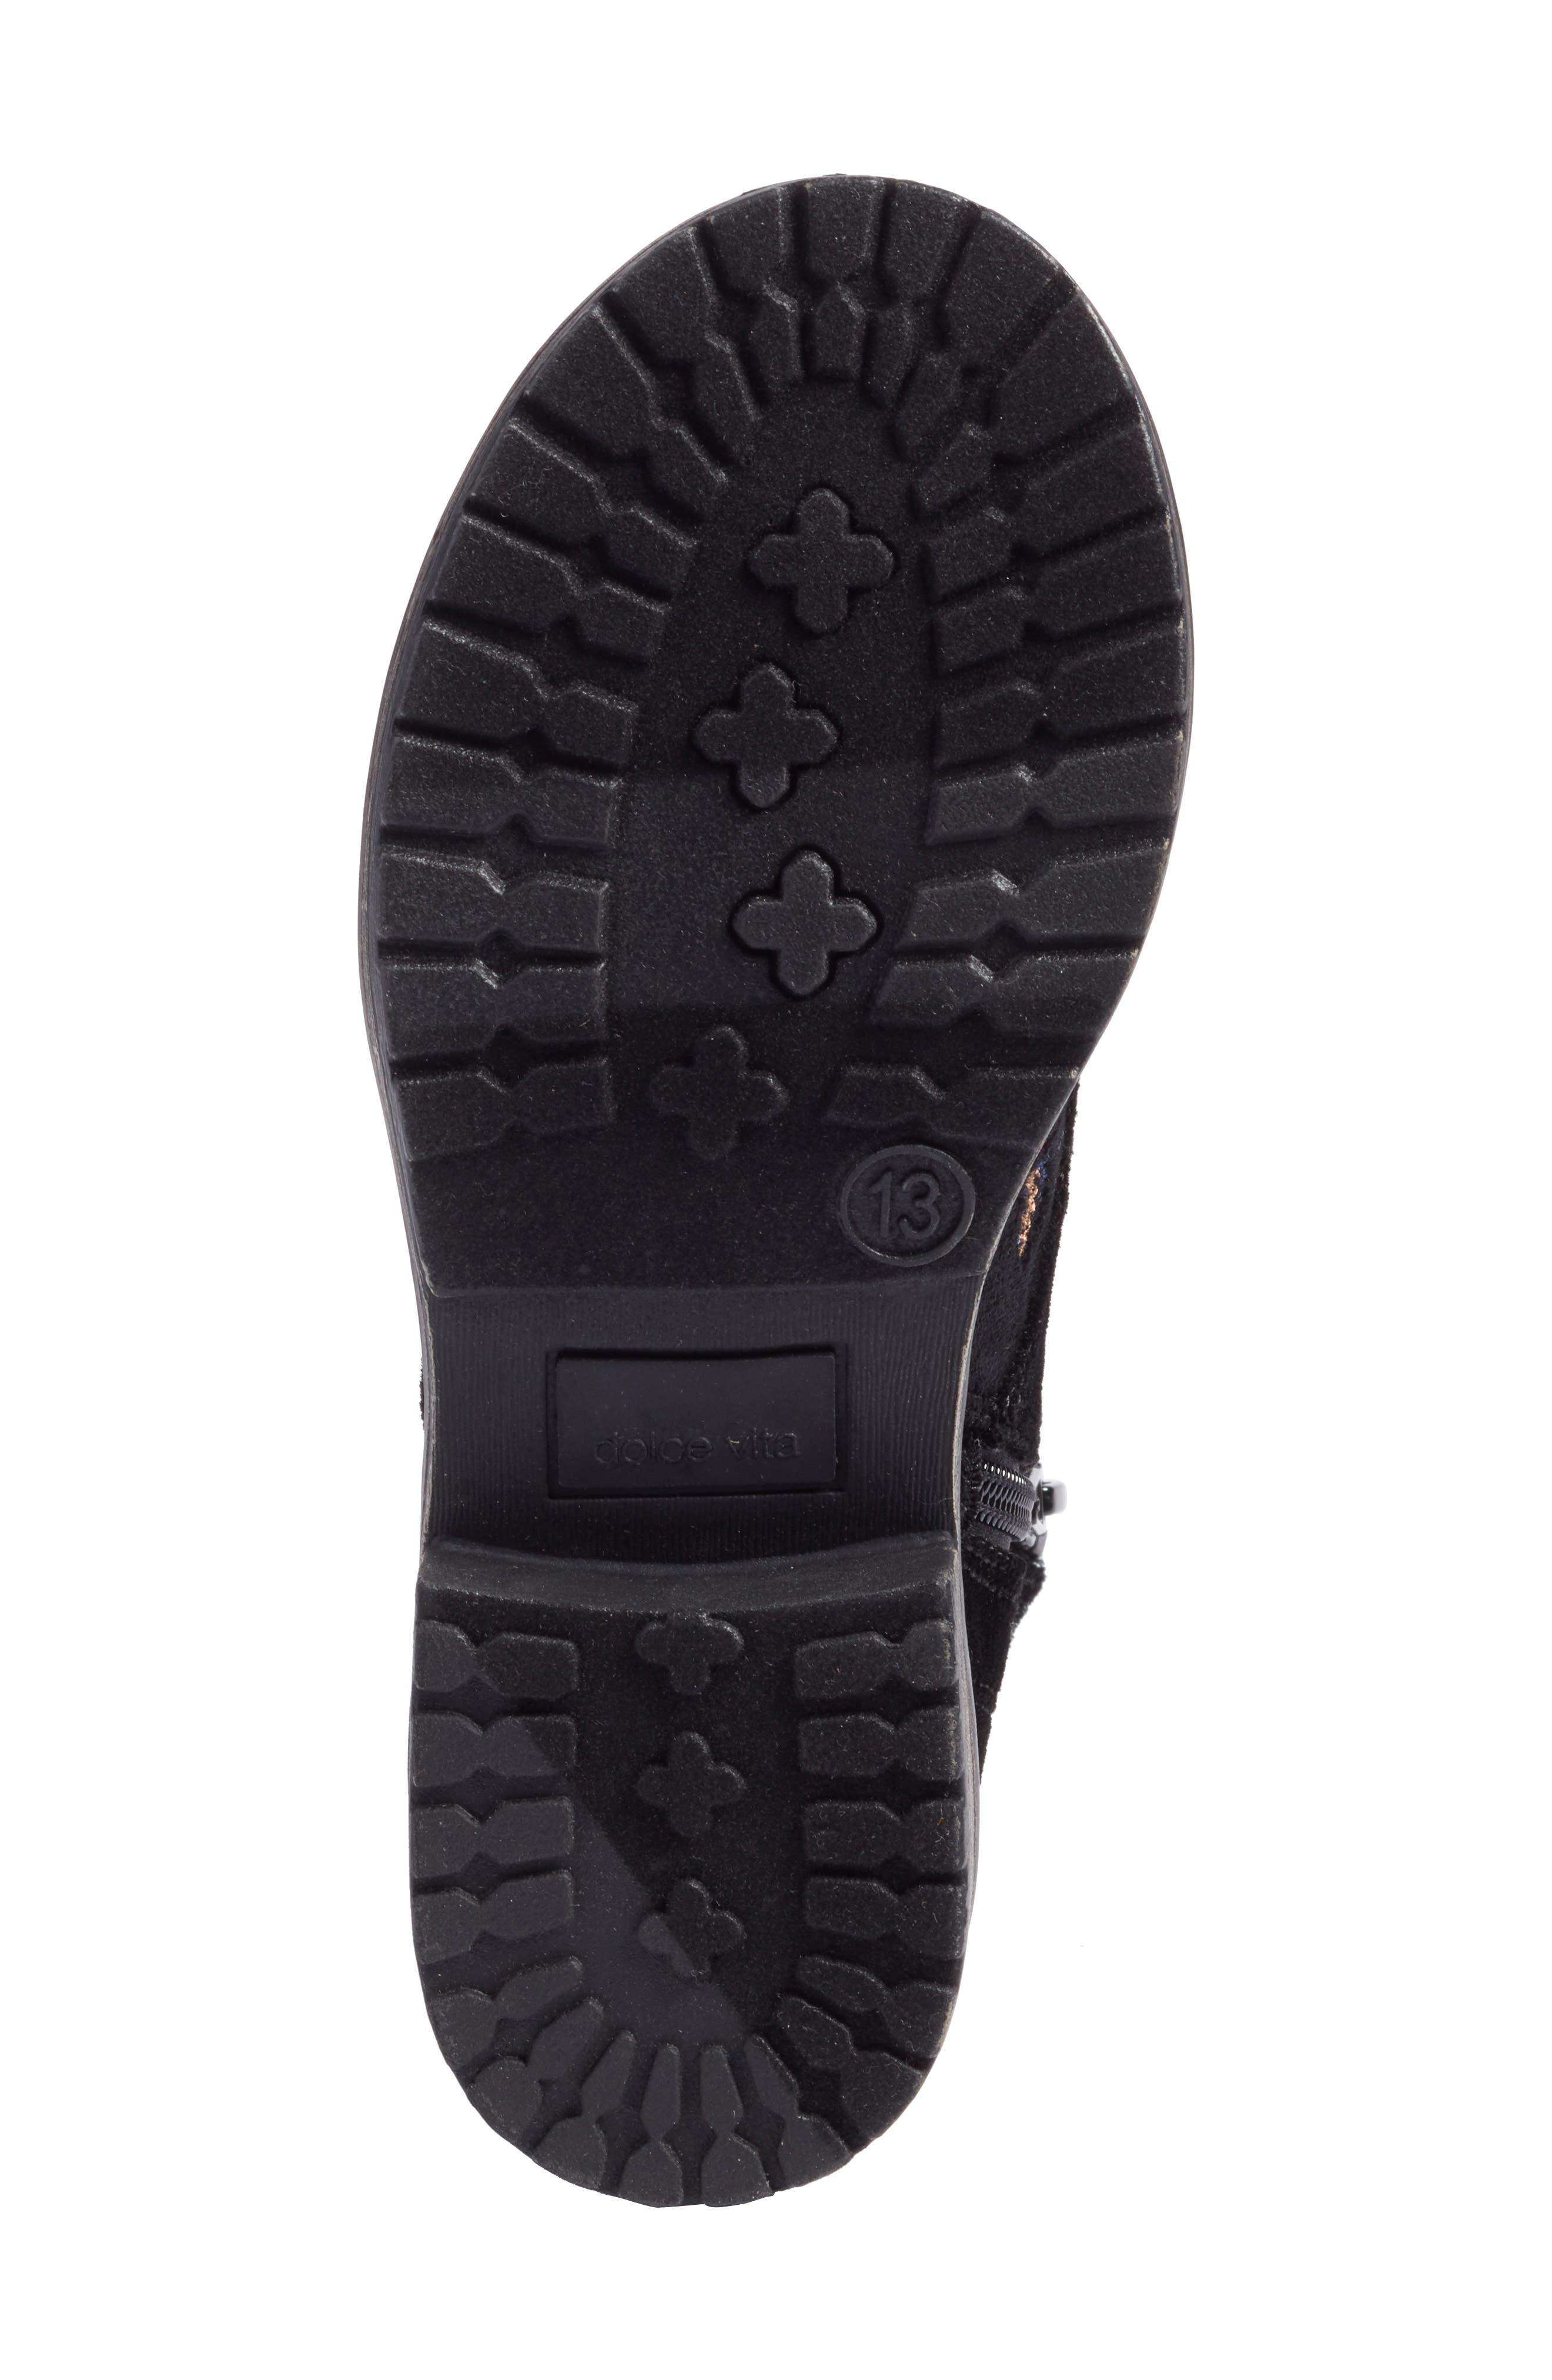 Lilla Combat Boot,                             Alternate thumbnail 6, color,                             Black Multi Velvet